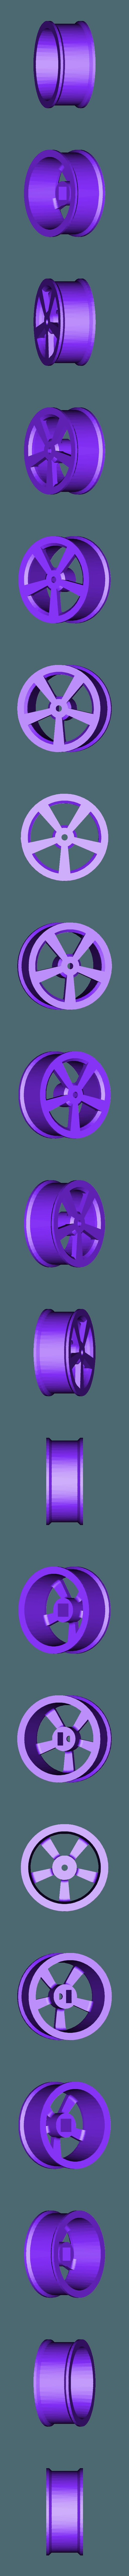 TruckV3_Axle_front_DrivenSingleRimx2.STL Download STL file 3D Printed RC Truck V3 • 3D print model, MrCrankyface